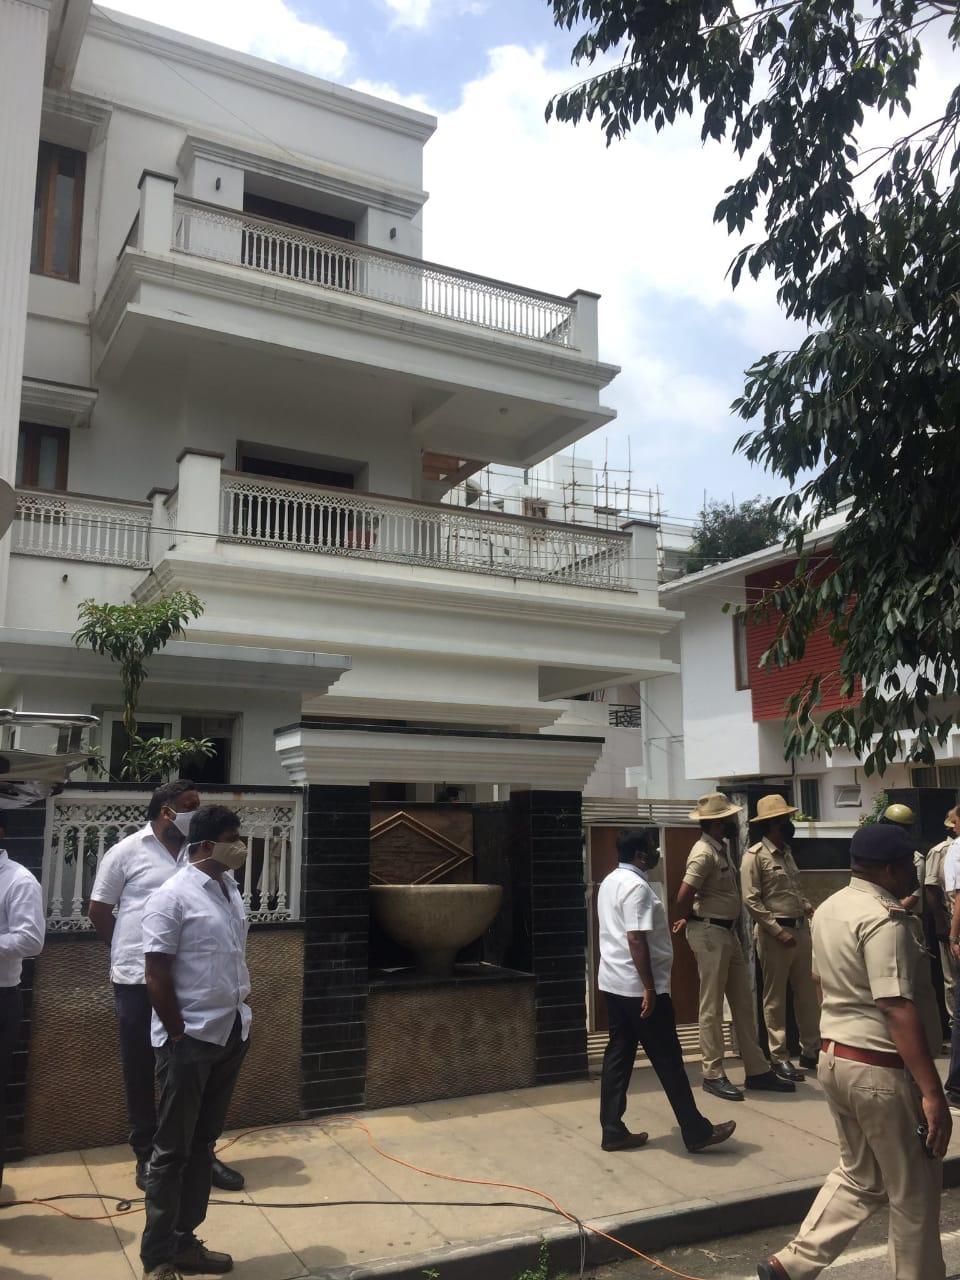 DK Shivakumar's house